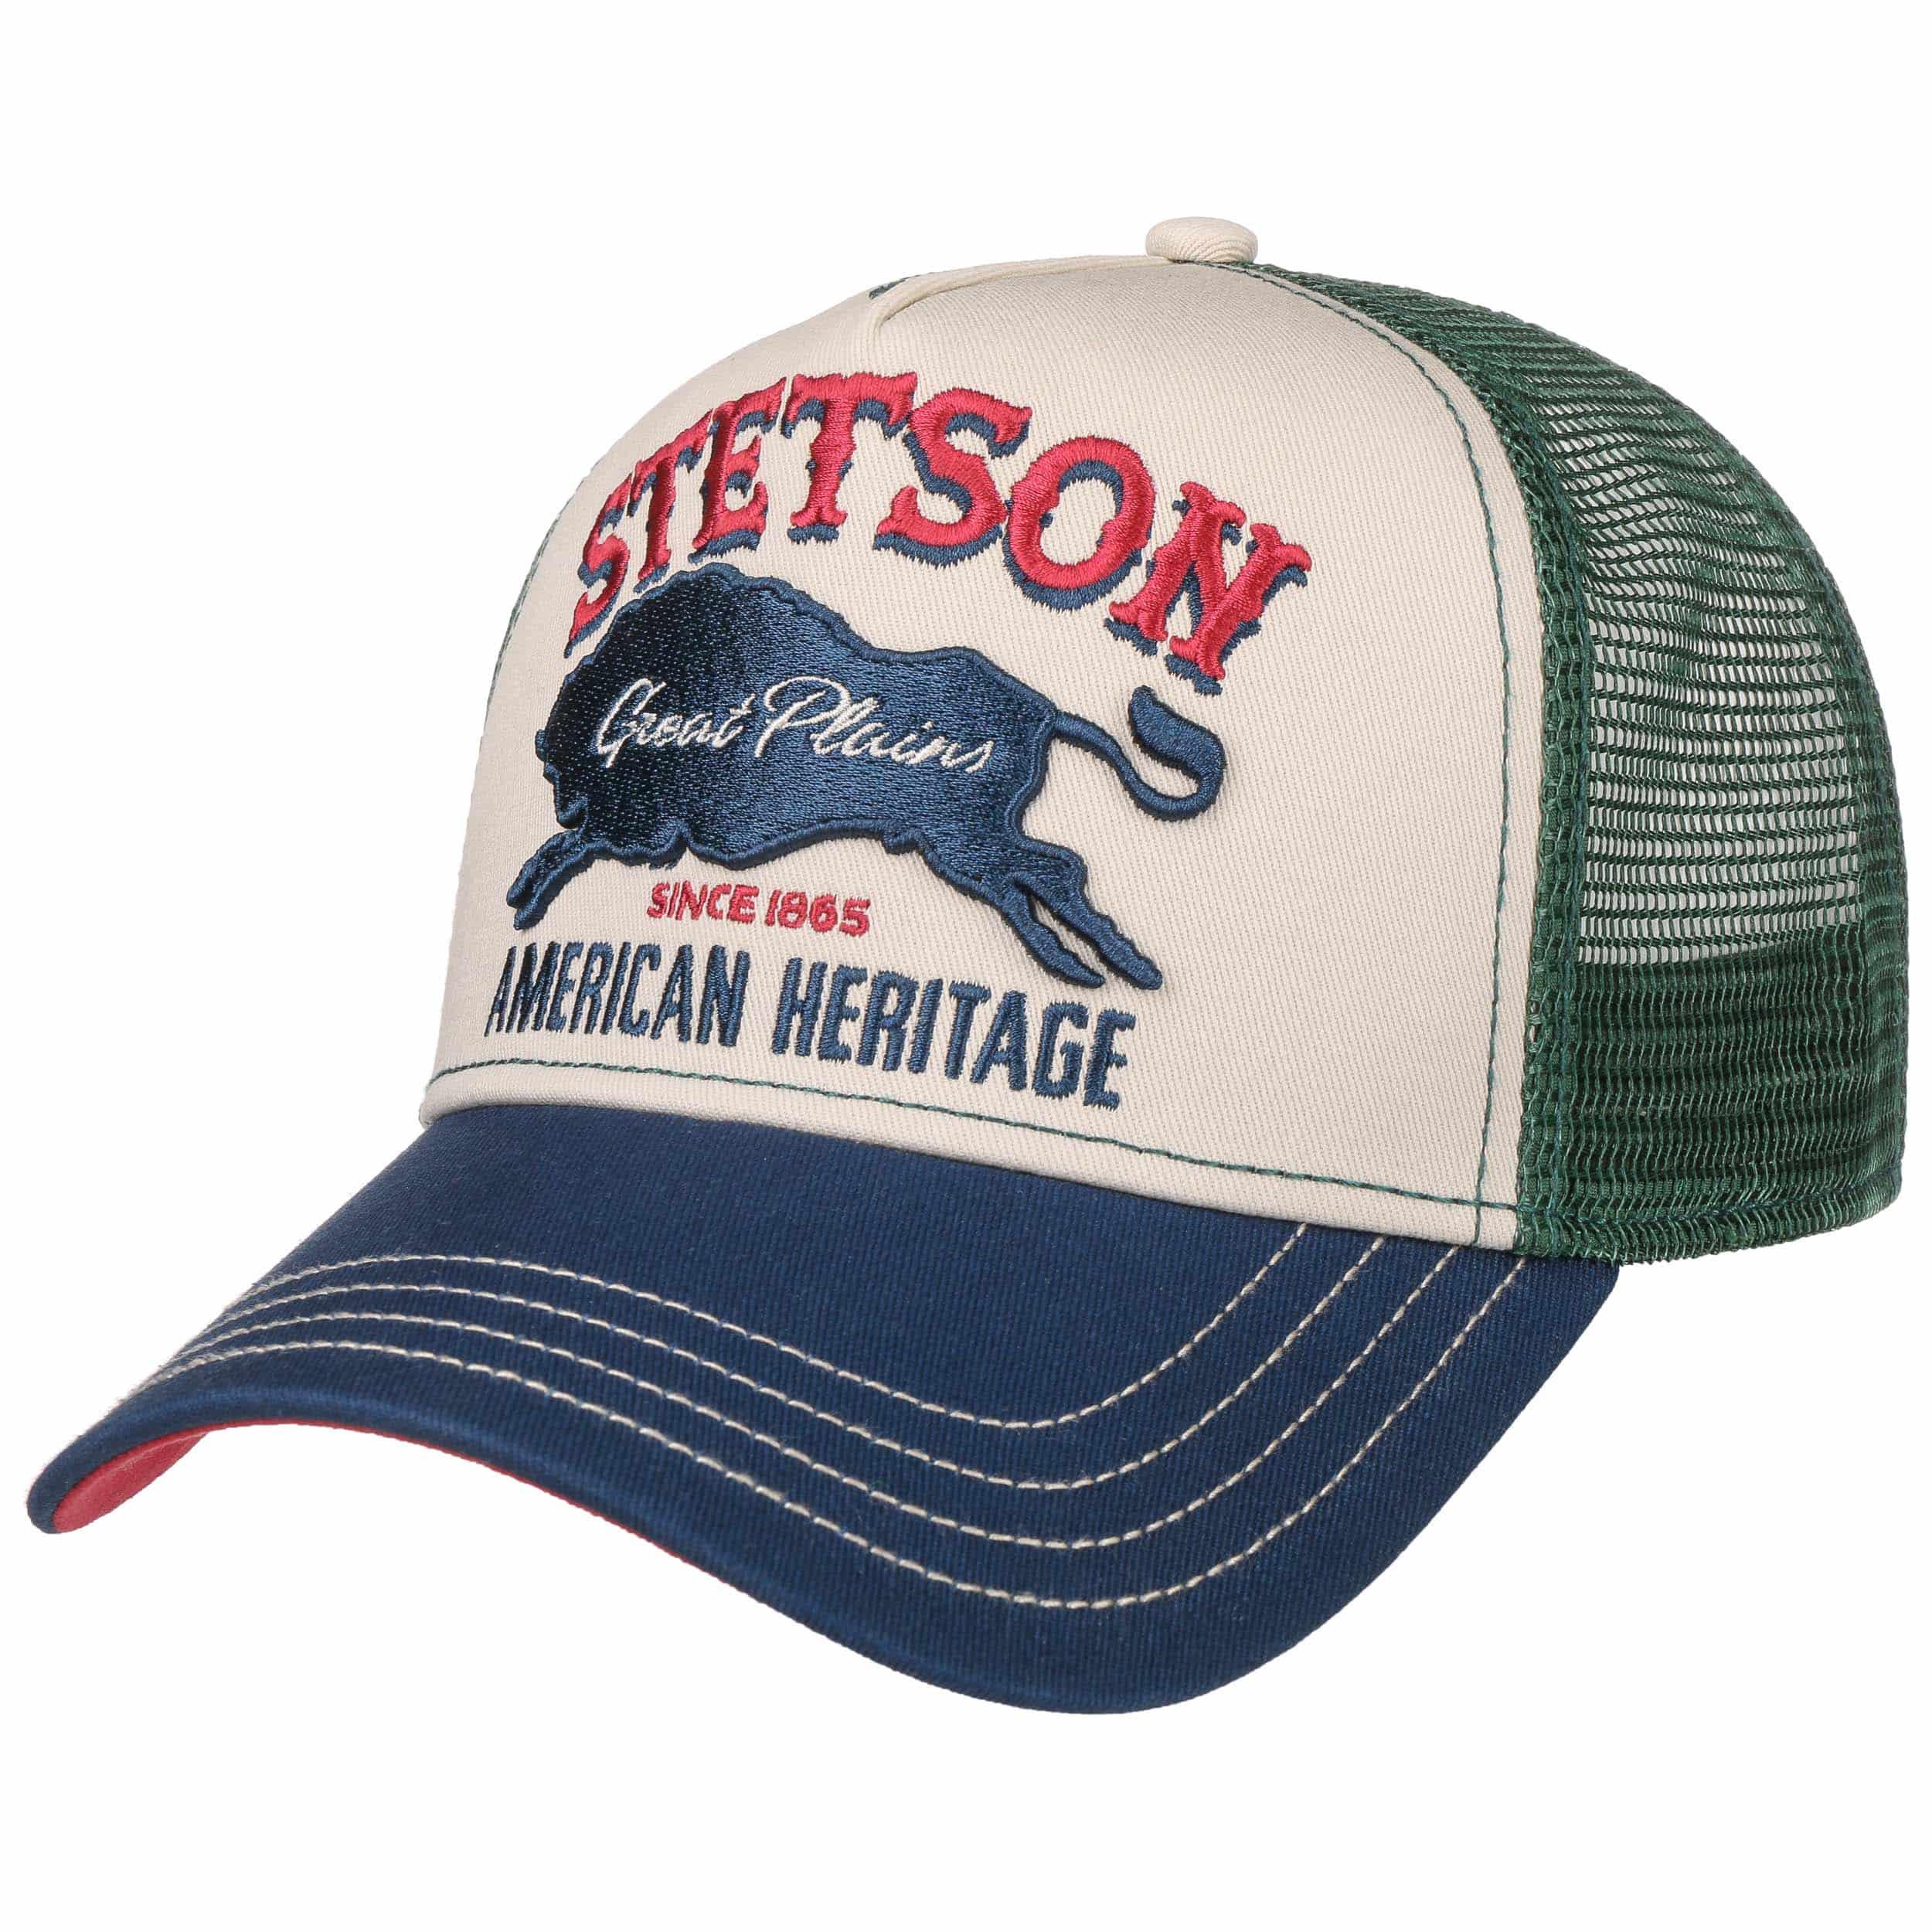 Baseballcap American Heritage Stetson